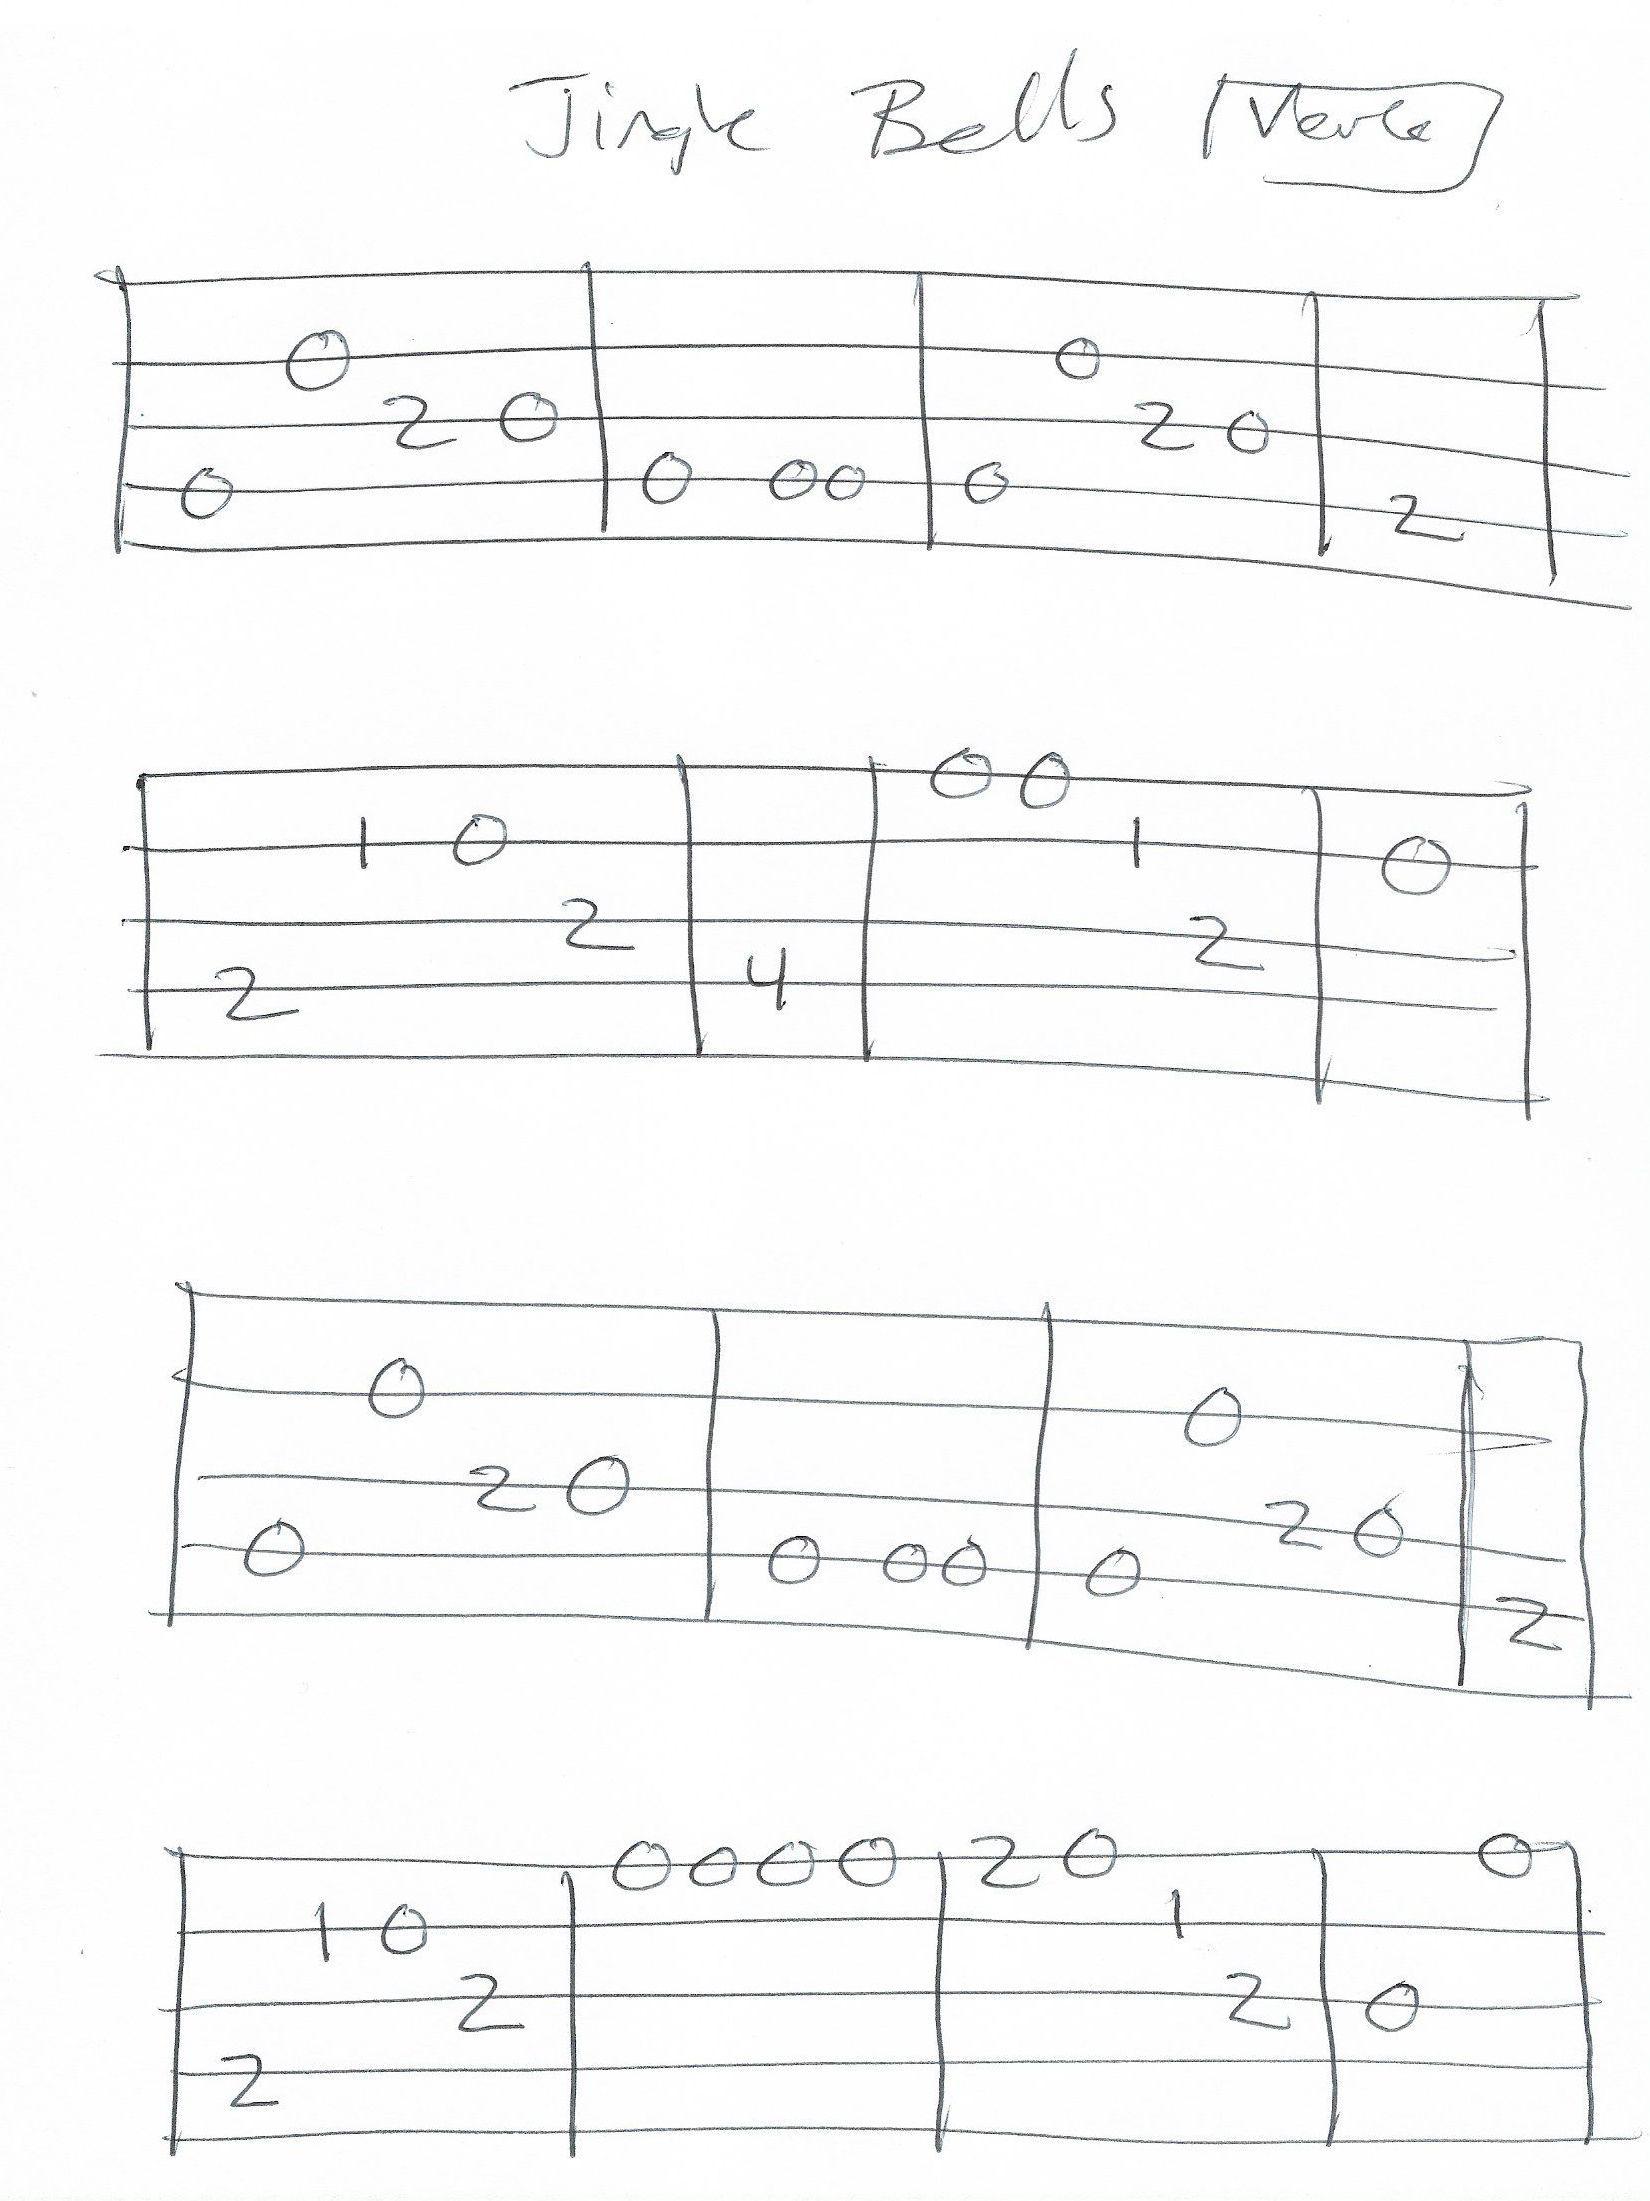 Jingle Bells - Banjo TAB in G - Page 1 of 2 | Banjo tabs, Banjo, Jingle bells